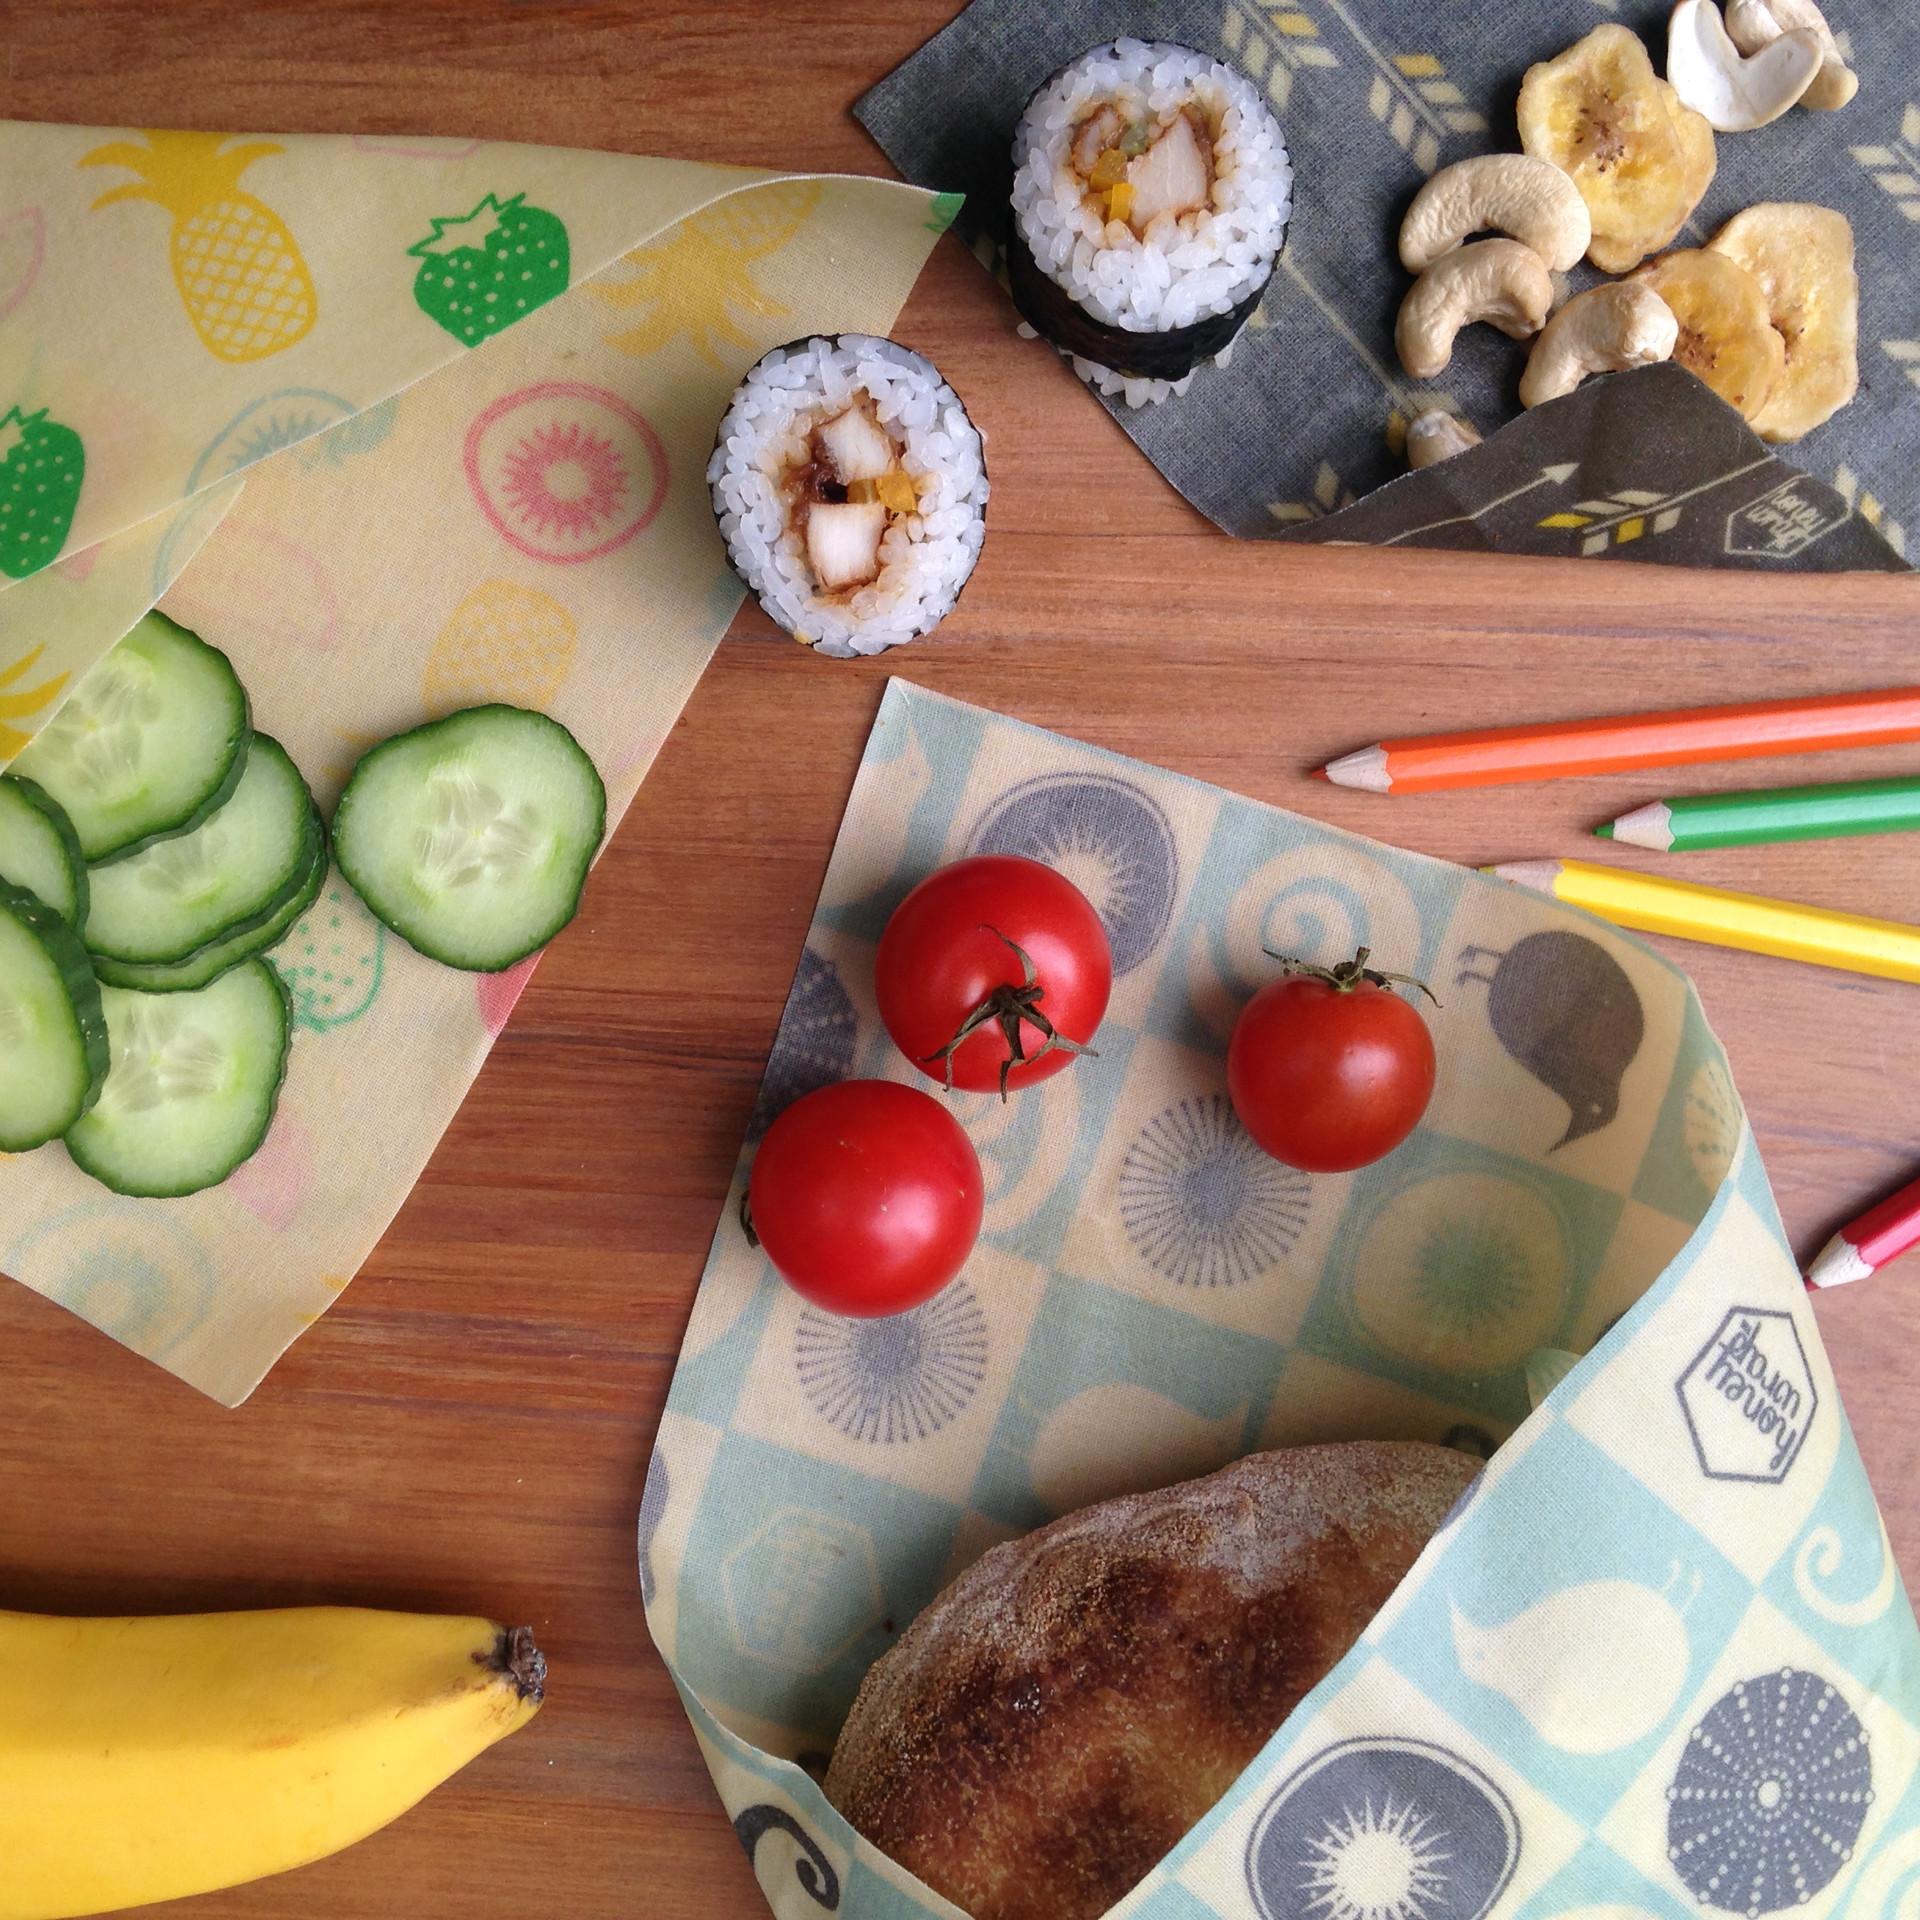 Honeywrap school lunch